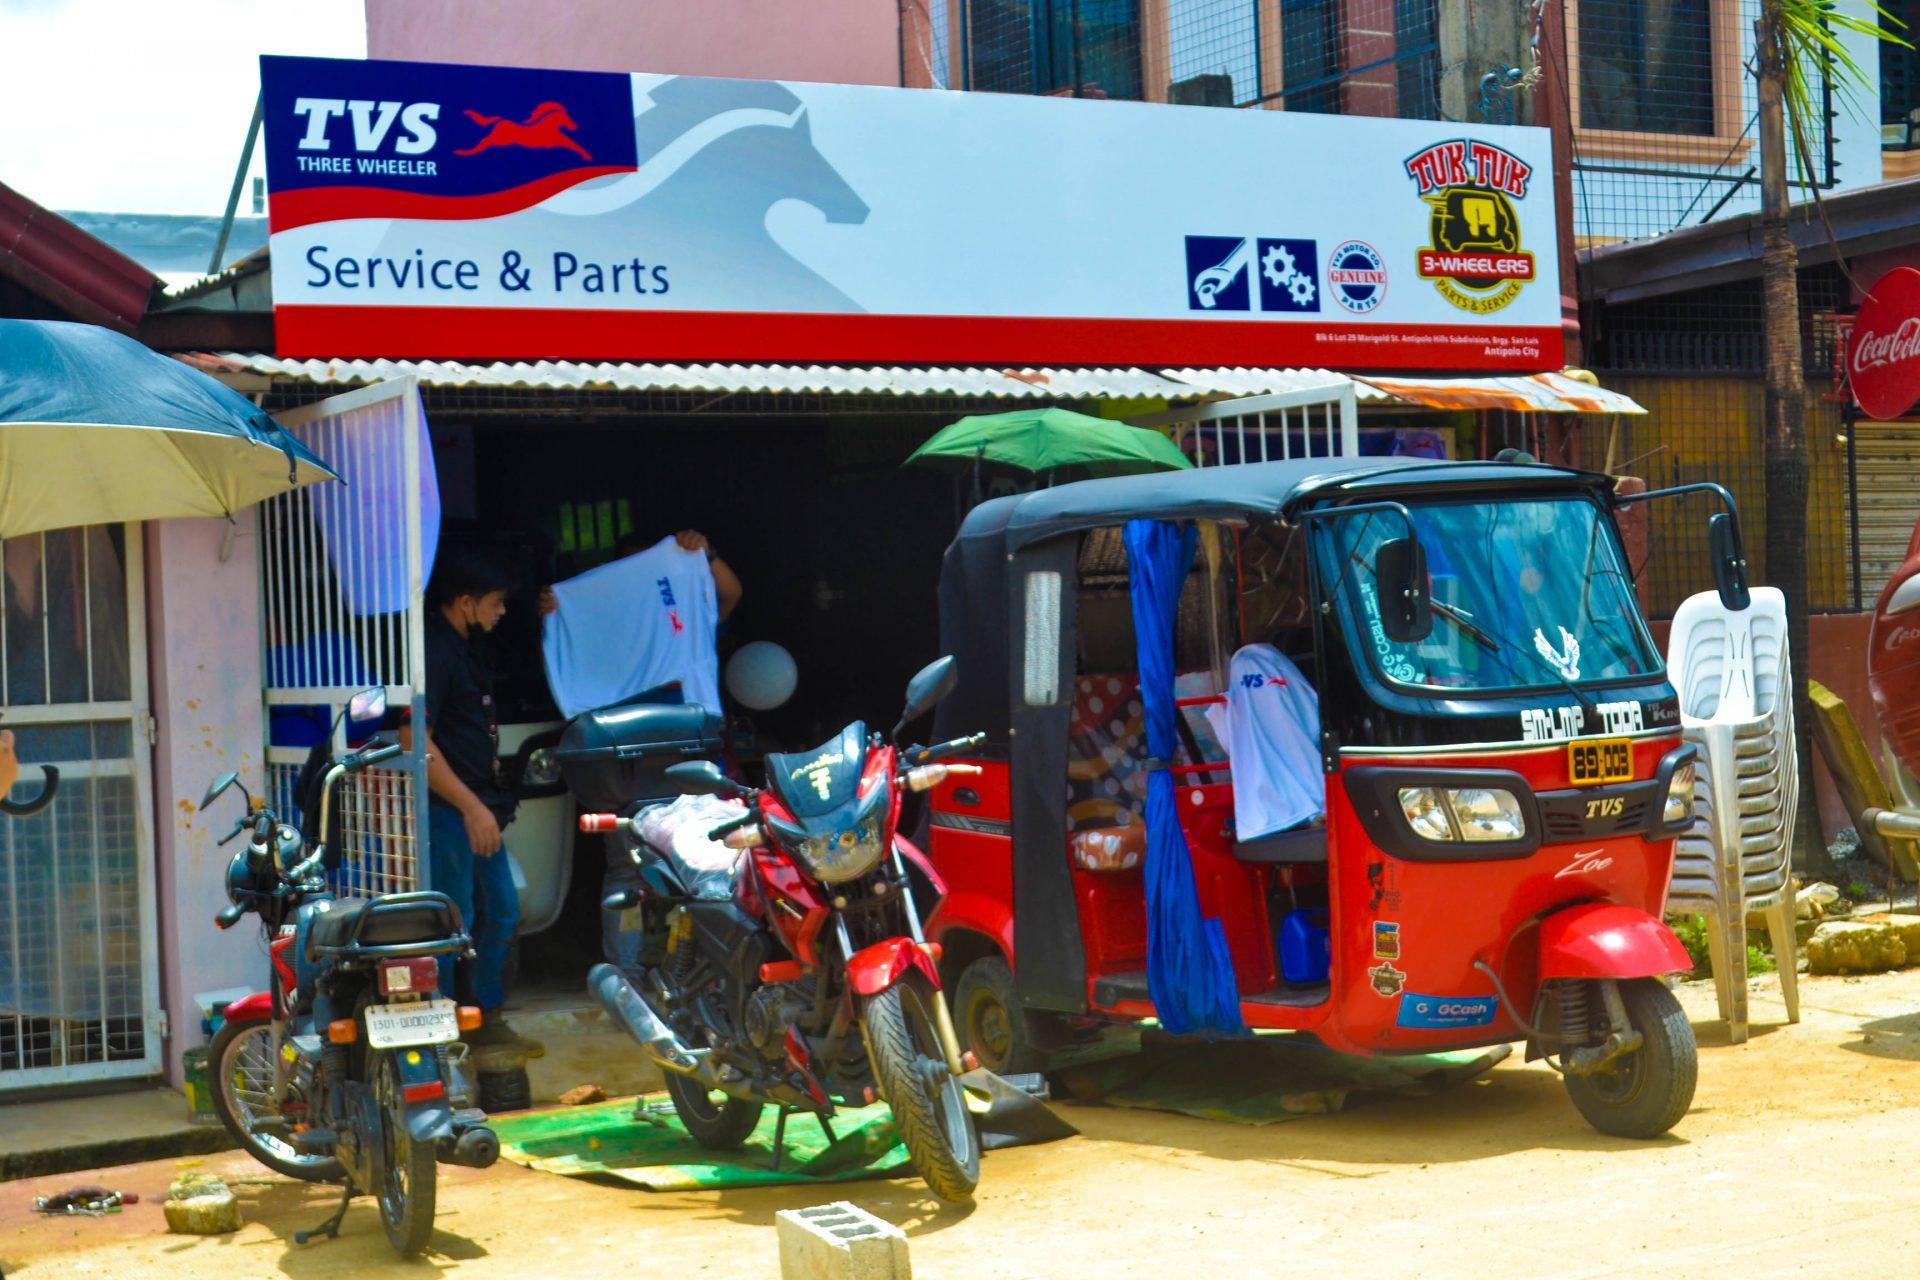 TVS King at Tuk Tuk 3-Wheelers Antipolo